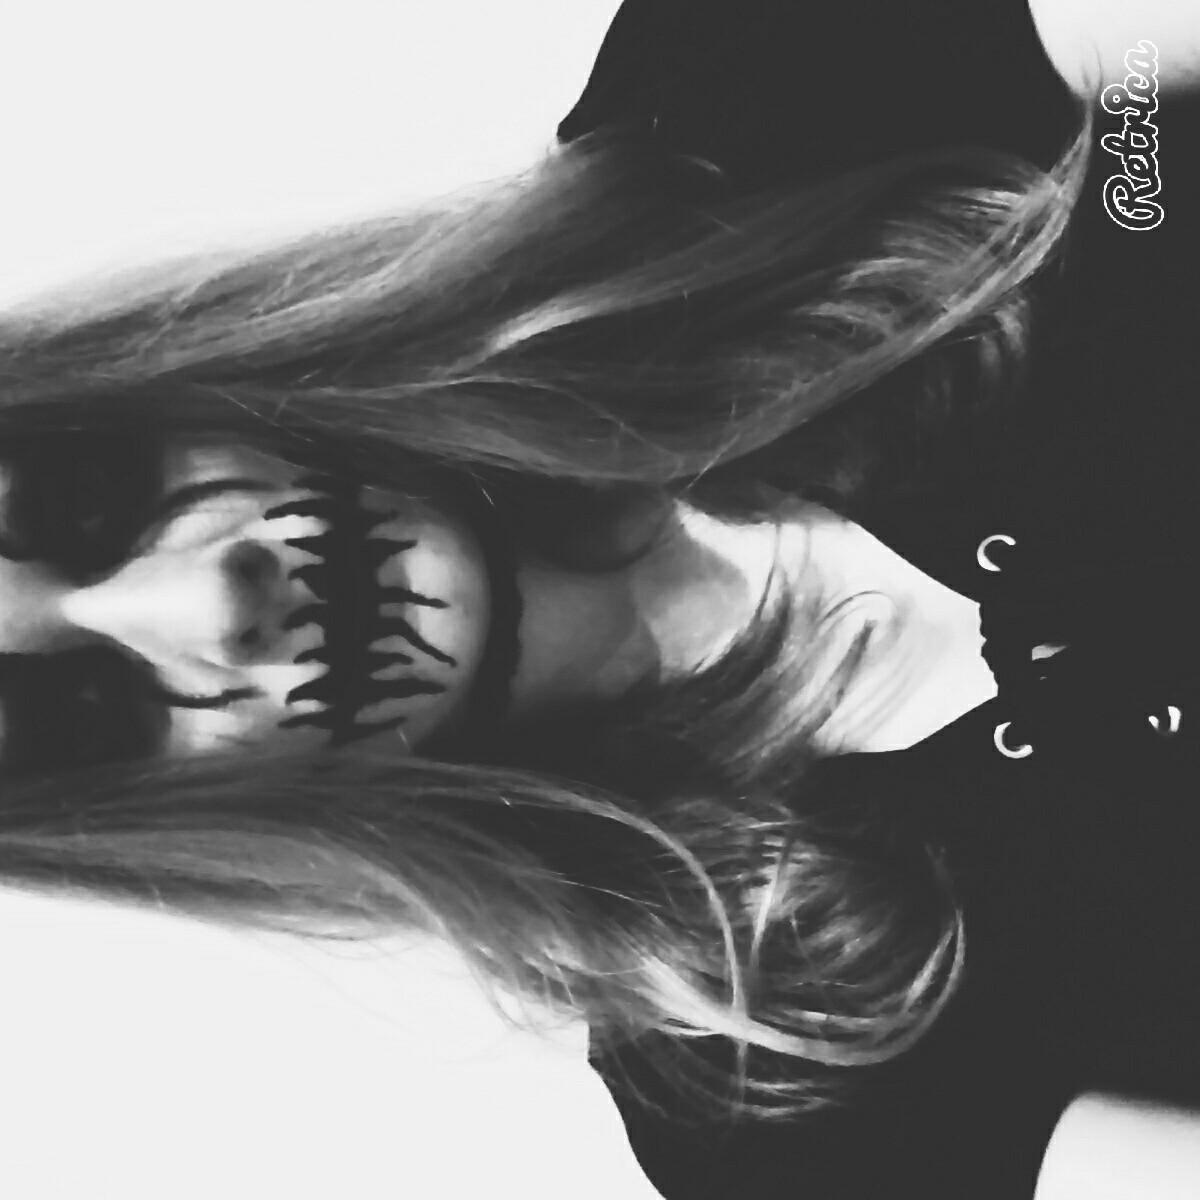 Astrid Stark